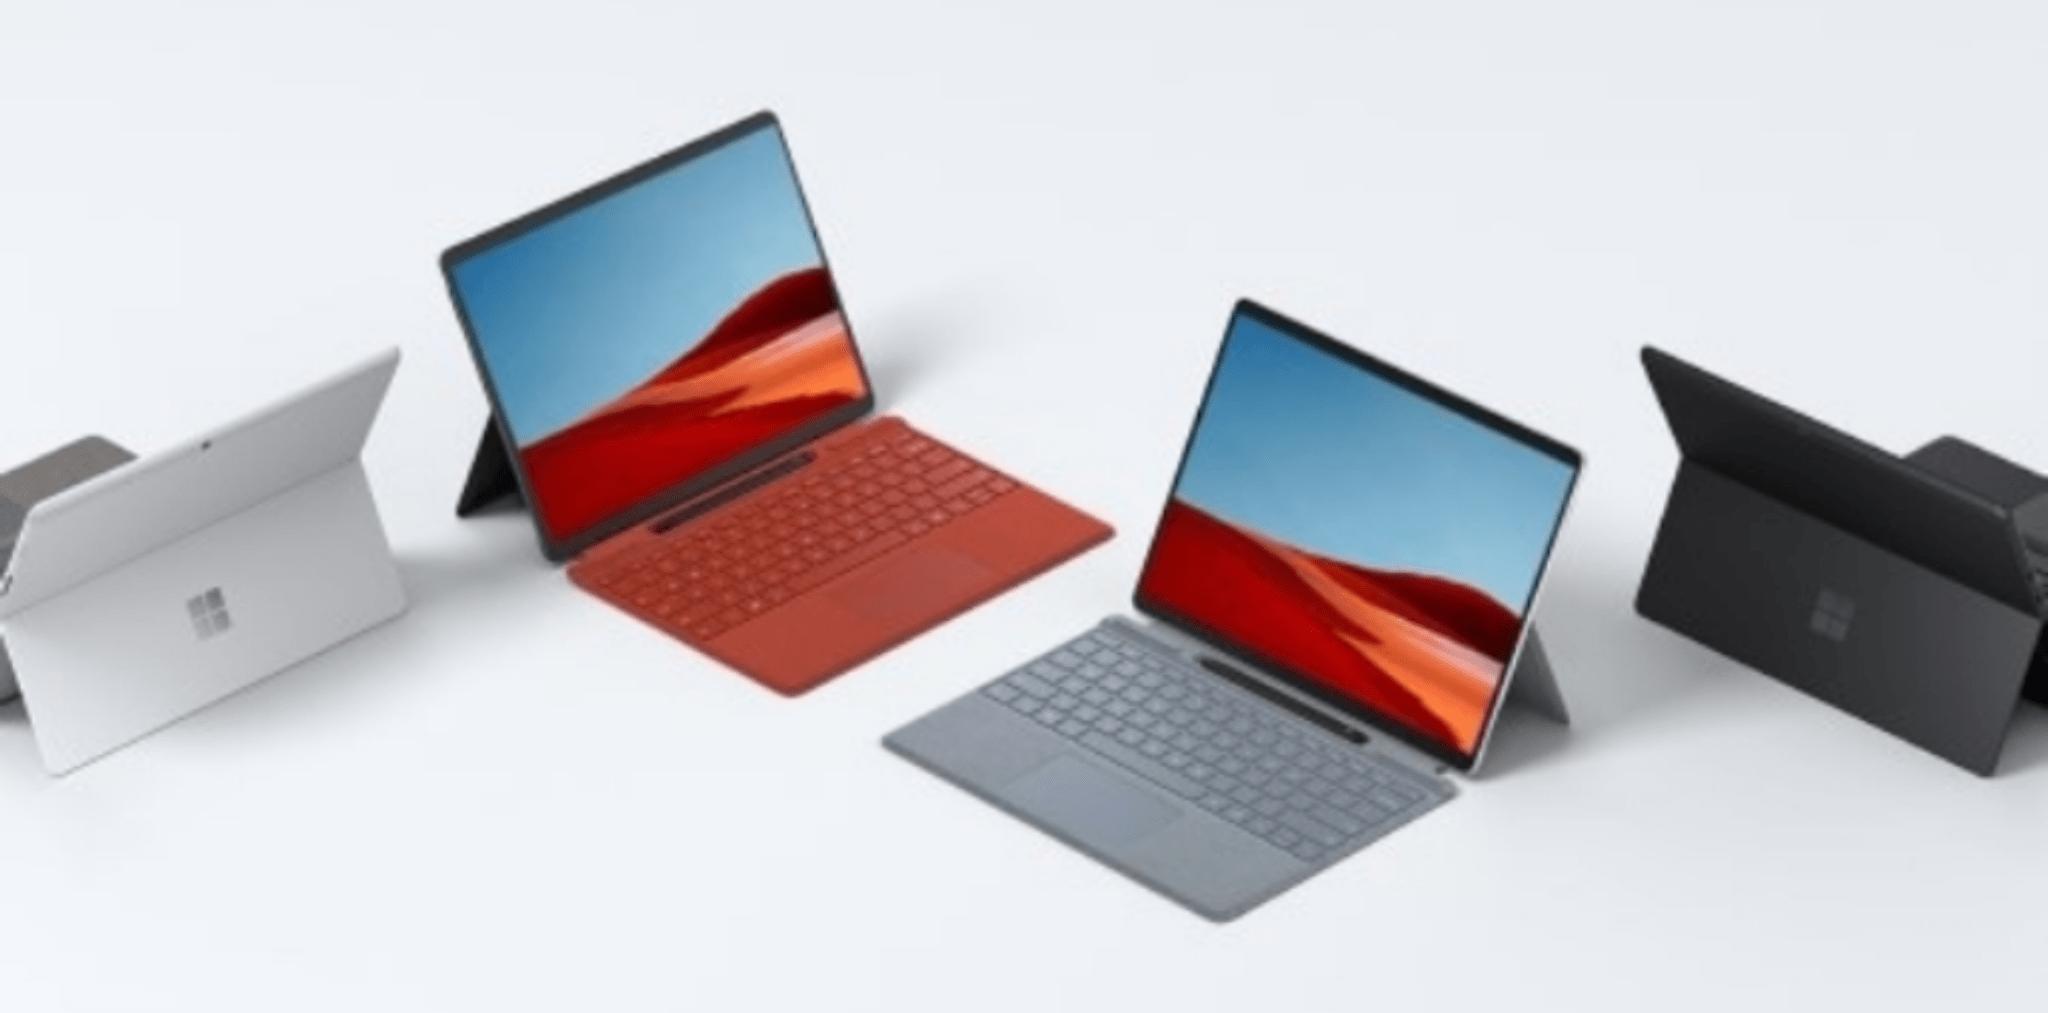 Surface Pro X 1